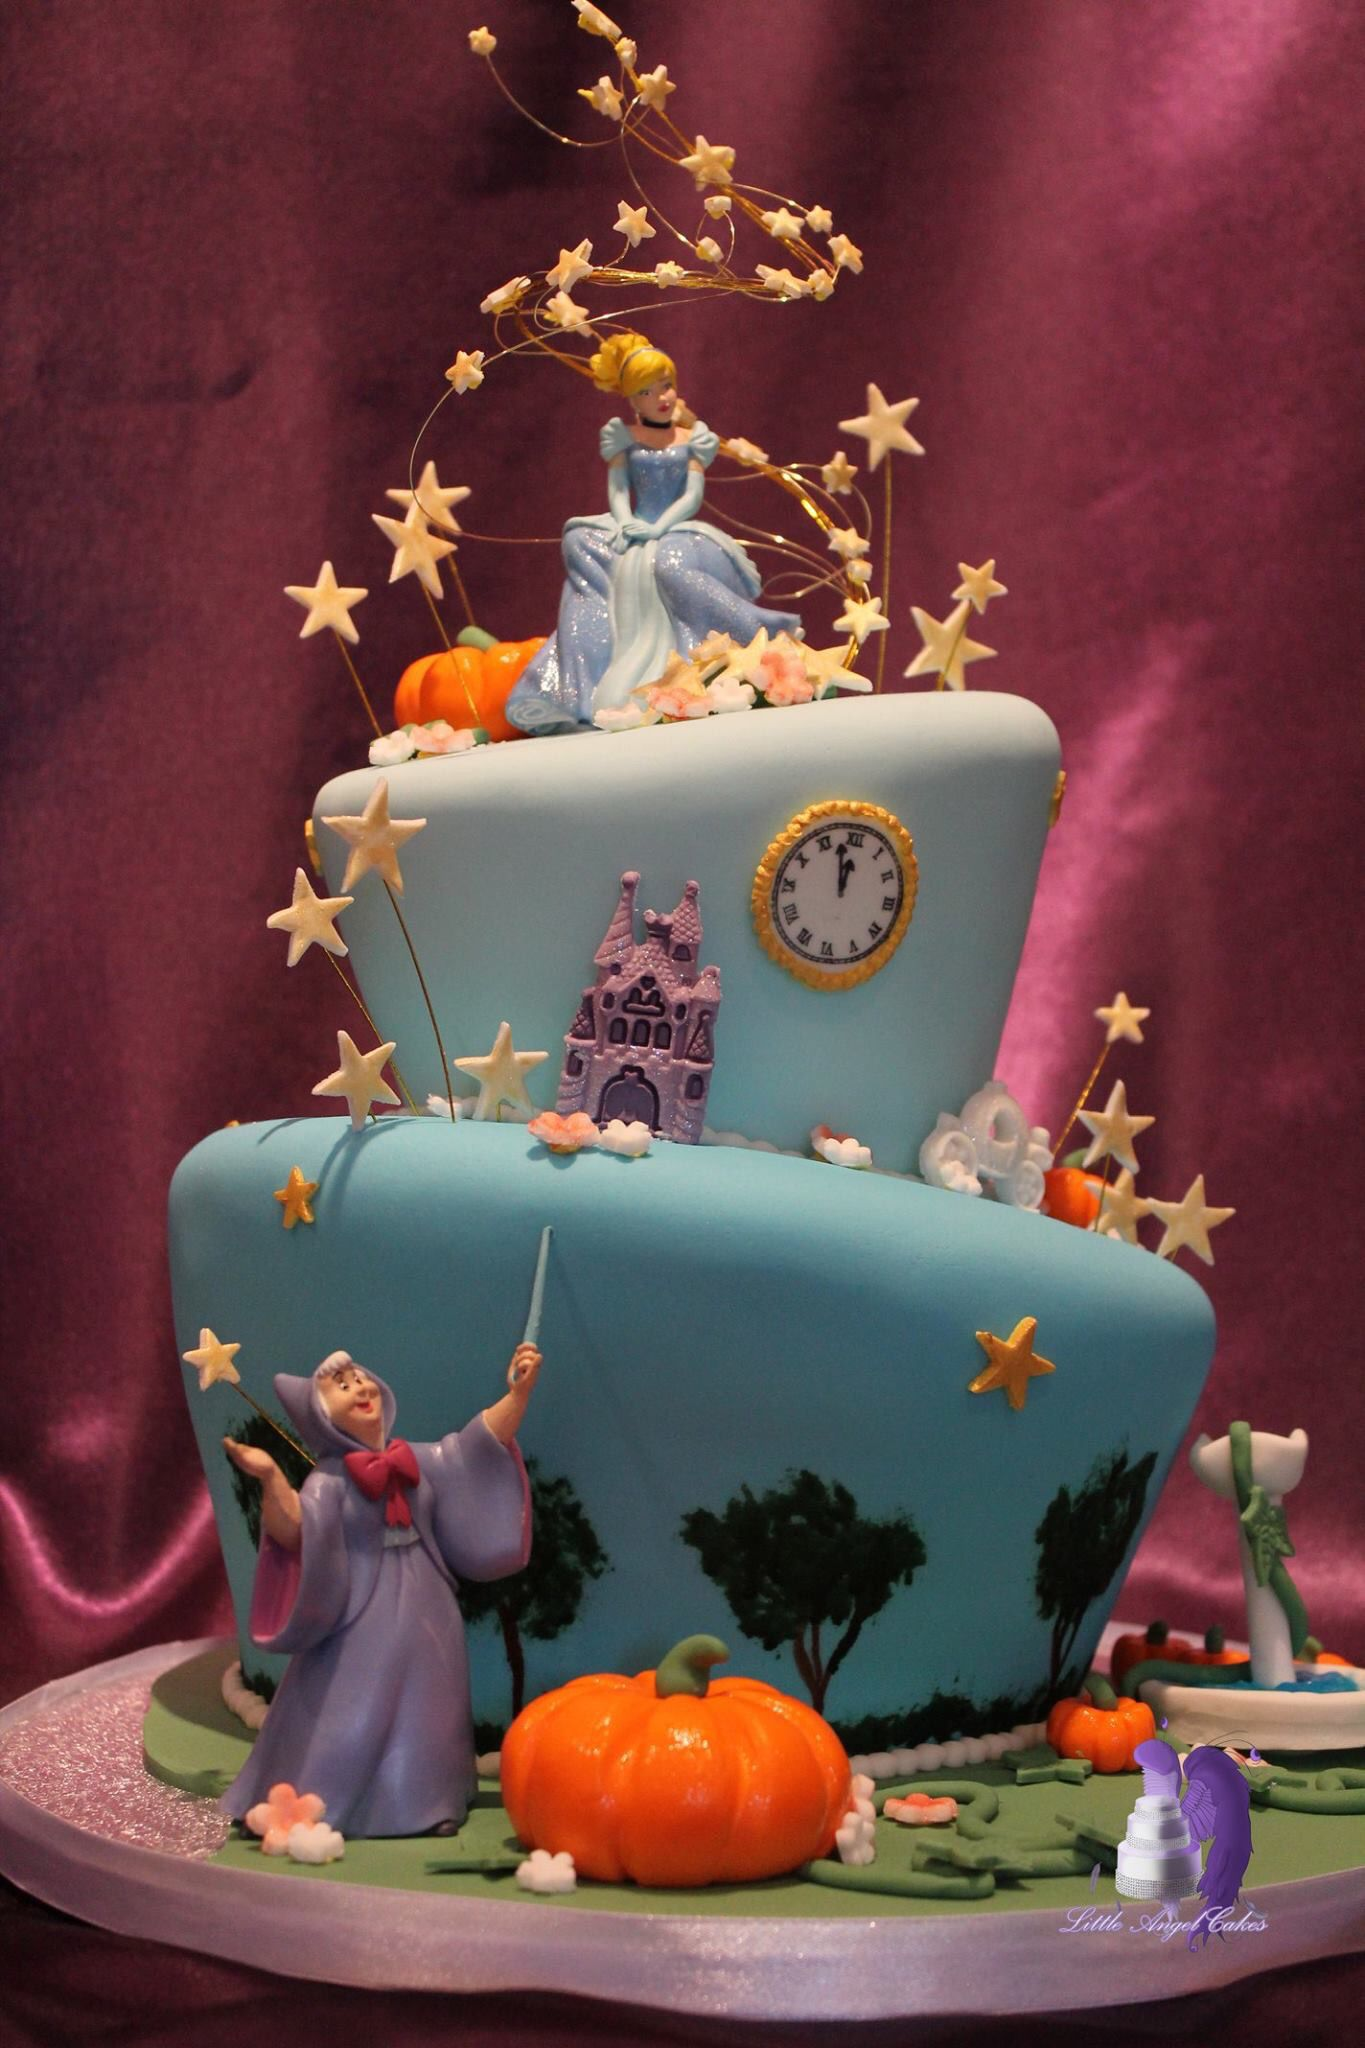 Cinderella Cake birthday cake Pinterest Cake Birthdays and